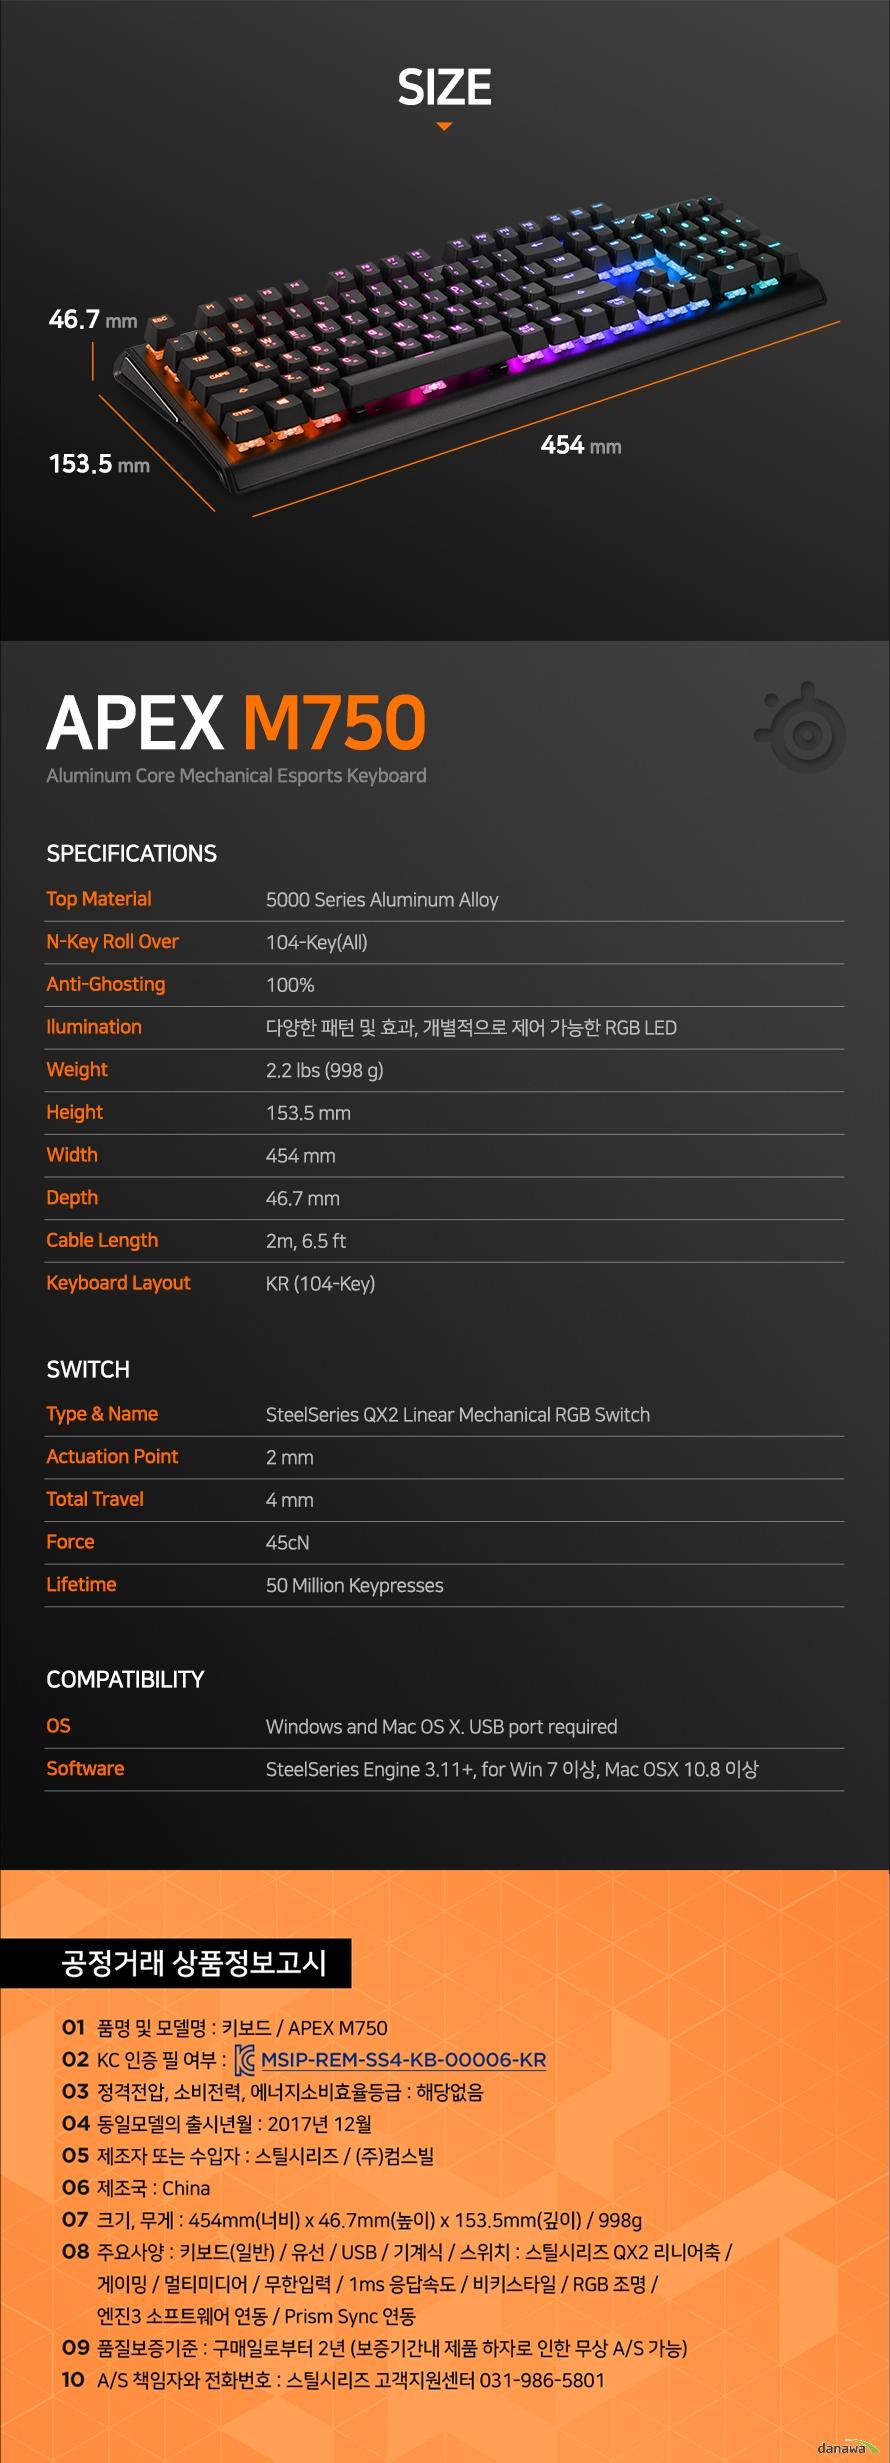 Top Material5000 Series Aluminum AlloyN-Key Roll Over104-Key(All)Anti-Ghosting100%Ilumination다양한 패턴 및 효과, 개별적으로 제어 가능한 RGB LEDWeight2.2 lbs (998 g)Height153.5 mmWidth454 mmDepth46.7 mmCable Length2m, 6.5 ftKeyboard LayoutKR (104-Key)Type & NameSteelSeries QX2 Linear Mechanical RGB SwitchActuation Point2 mmTotal Travel4 mmForce45cNLifetime50 Million KeypressesOSWindows and Mac OS X. USB port requiredSoftwareSteelSeries Engine 3.11+, for Win 7 이상, Mac OSX 10.8 이상품명 및 모델명 : 키보드 / APEX M750KC 인증 필 여부 : 해당없음정격전압, 소비전력, 에너지소비효율등급 : 해당없음동일모델의 출시년월 : 2017년 12월제조자 또는 수입자 : 스틸시리즈 / (주)컴스빌제조국 : China크기, 무게 : 454mm(너비) x 46.7mm(높이) x 153.5mm(깊이) / 998g주요사양 : 키보드(일반) / 유선 / USB / 기계식 / 스위치 : 스틸시리즈 QX2 리니어축 / 게이밍 / 멀티미디어 / 무한입력 / 1ms 응답속도 / 비키스타일 / RGB 조명 / 엔진3 소프트웨어 연동 / Prism Sync 연동품질보증기준 : 구매일로부터 2년 (보증기간내 제품 하자로 인한 무상 A/S 가능)A/S 책임자와 전화번호 : 스틸시리즈 고객지원센터 031-986-5801